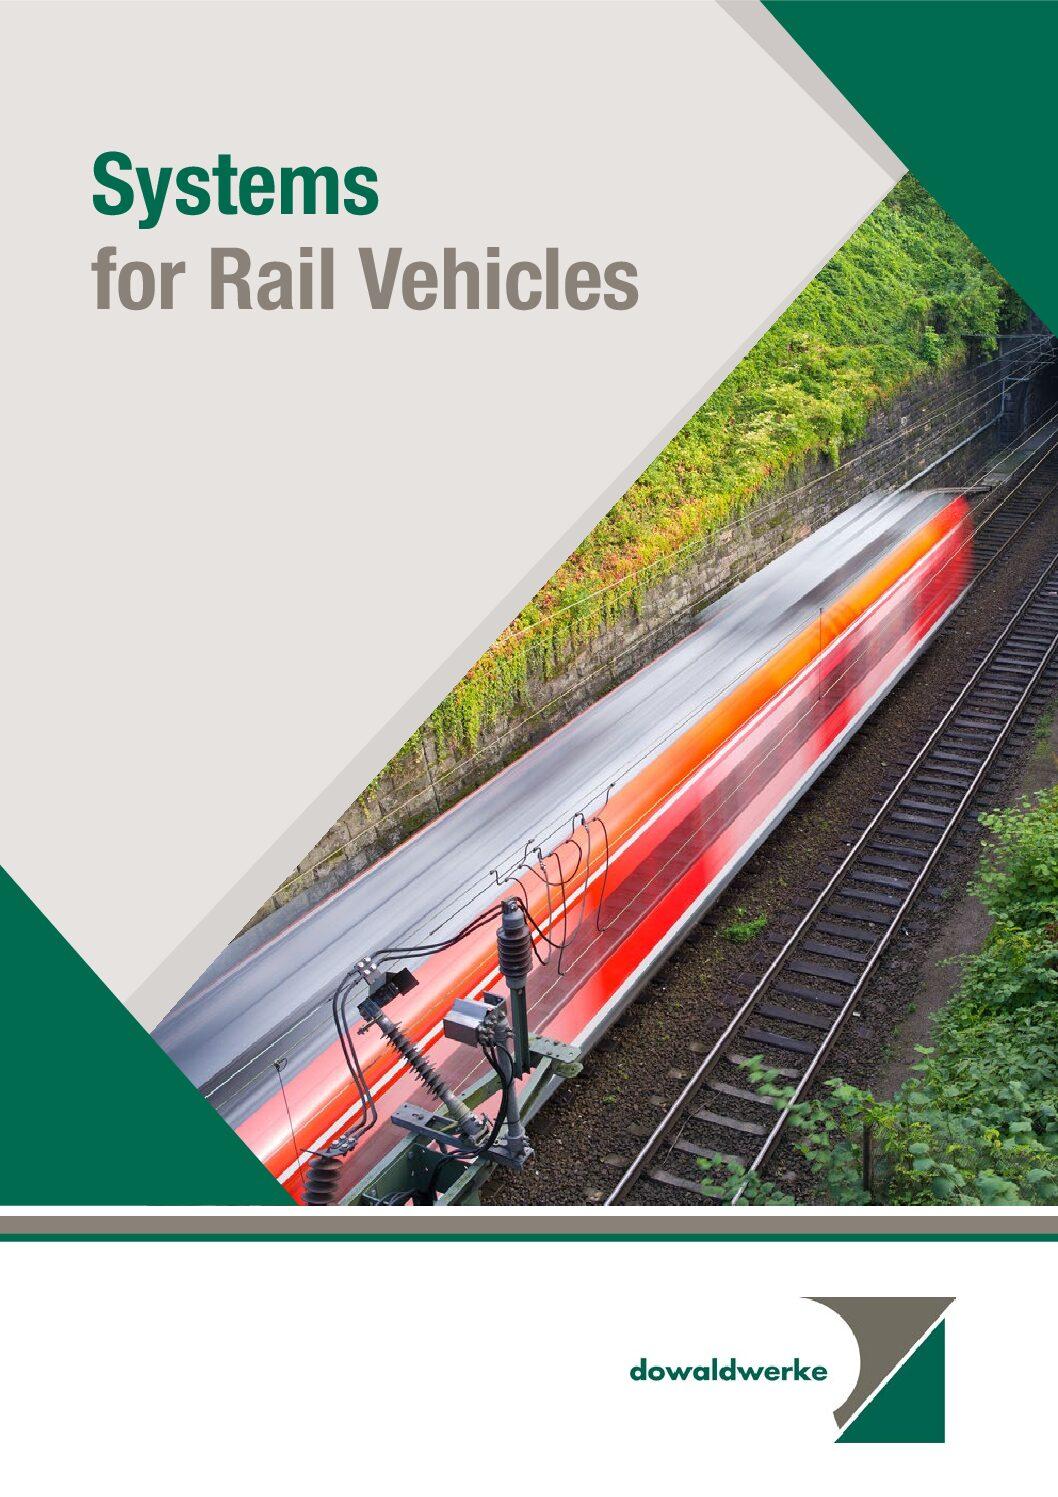 Dowaldwerke GmbH – Systems for Rail Vehicles